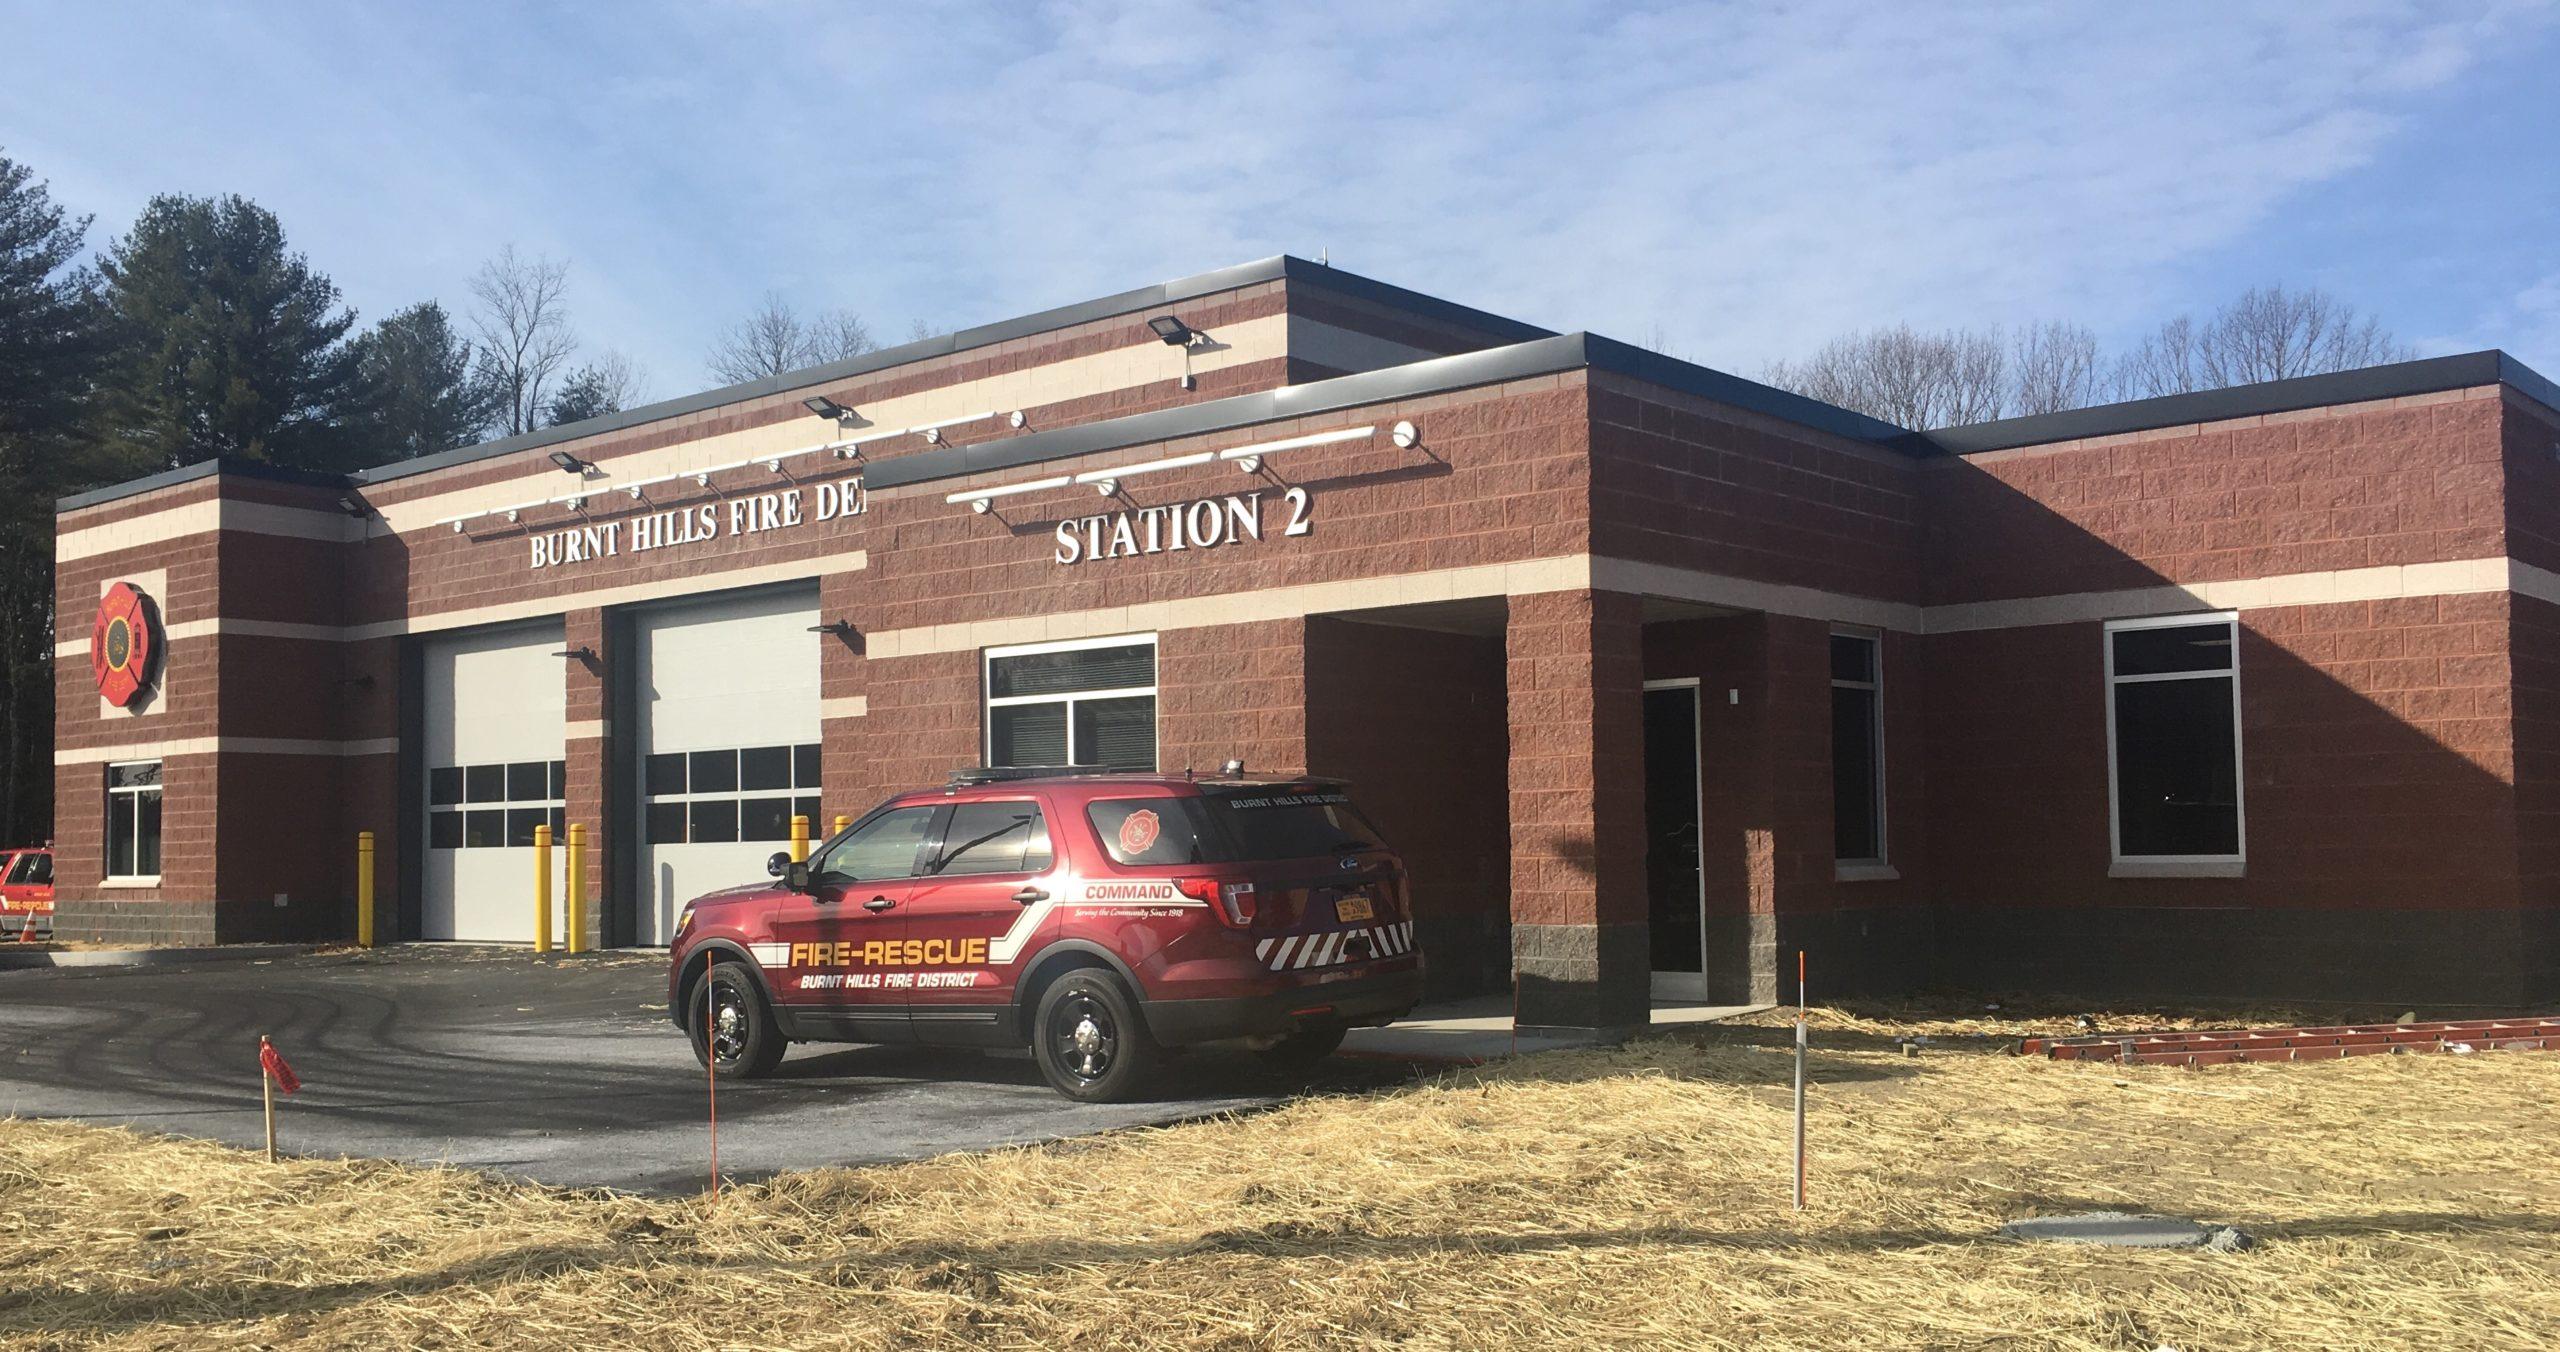 Burnt Hills Fire Station #2